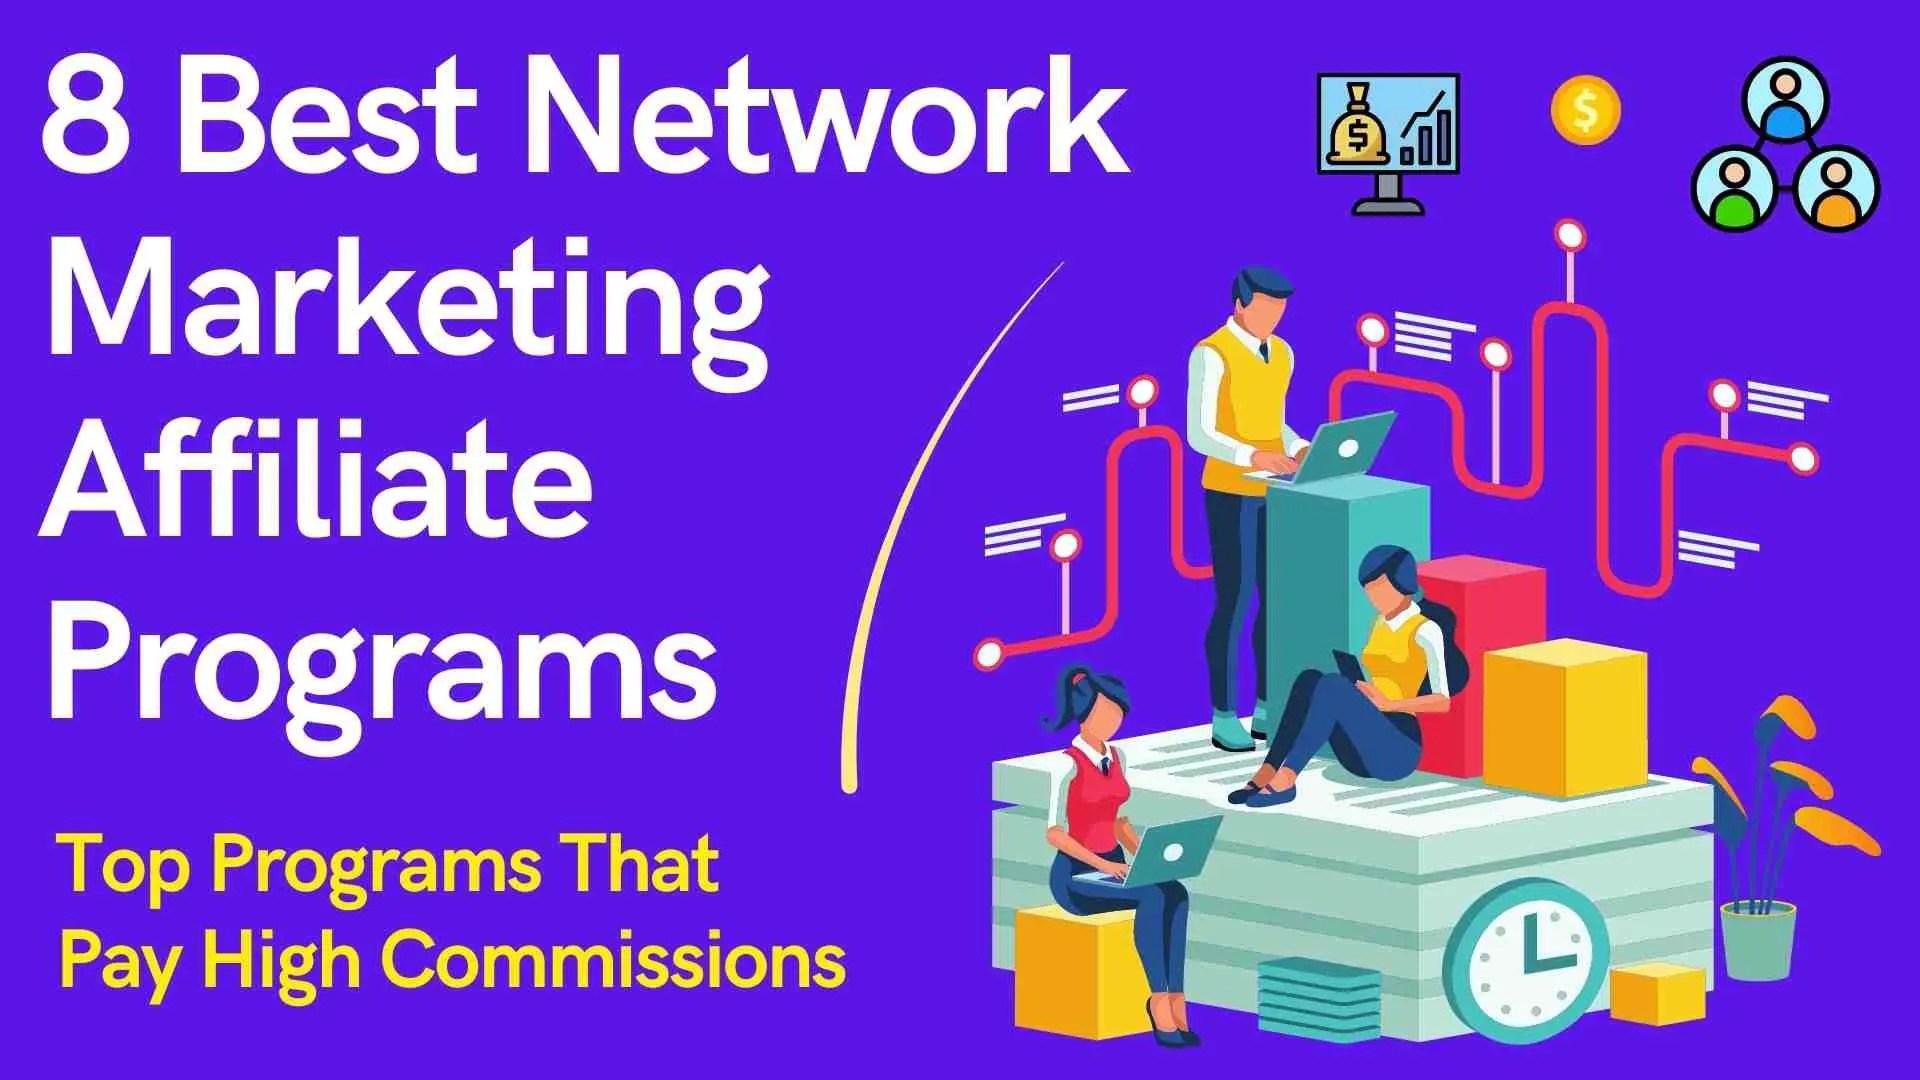 Best Network Marketing Affiliate Programs